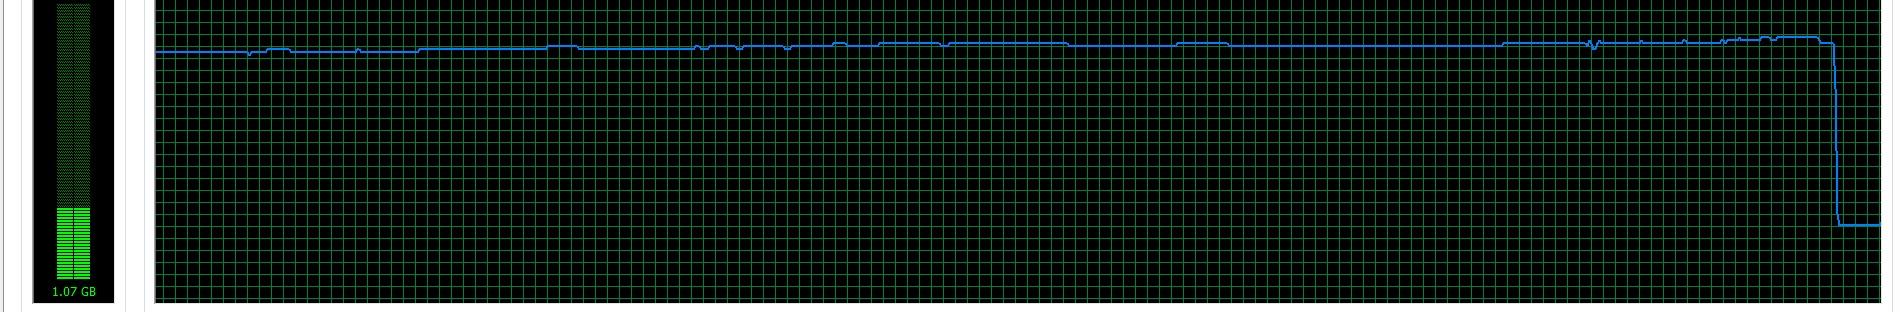 WD RAM Usage